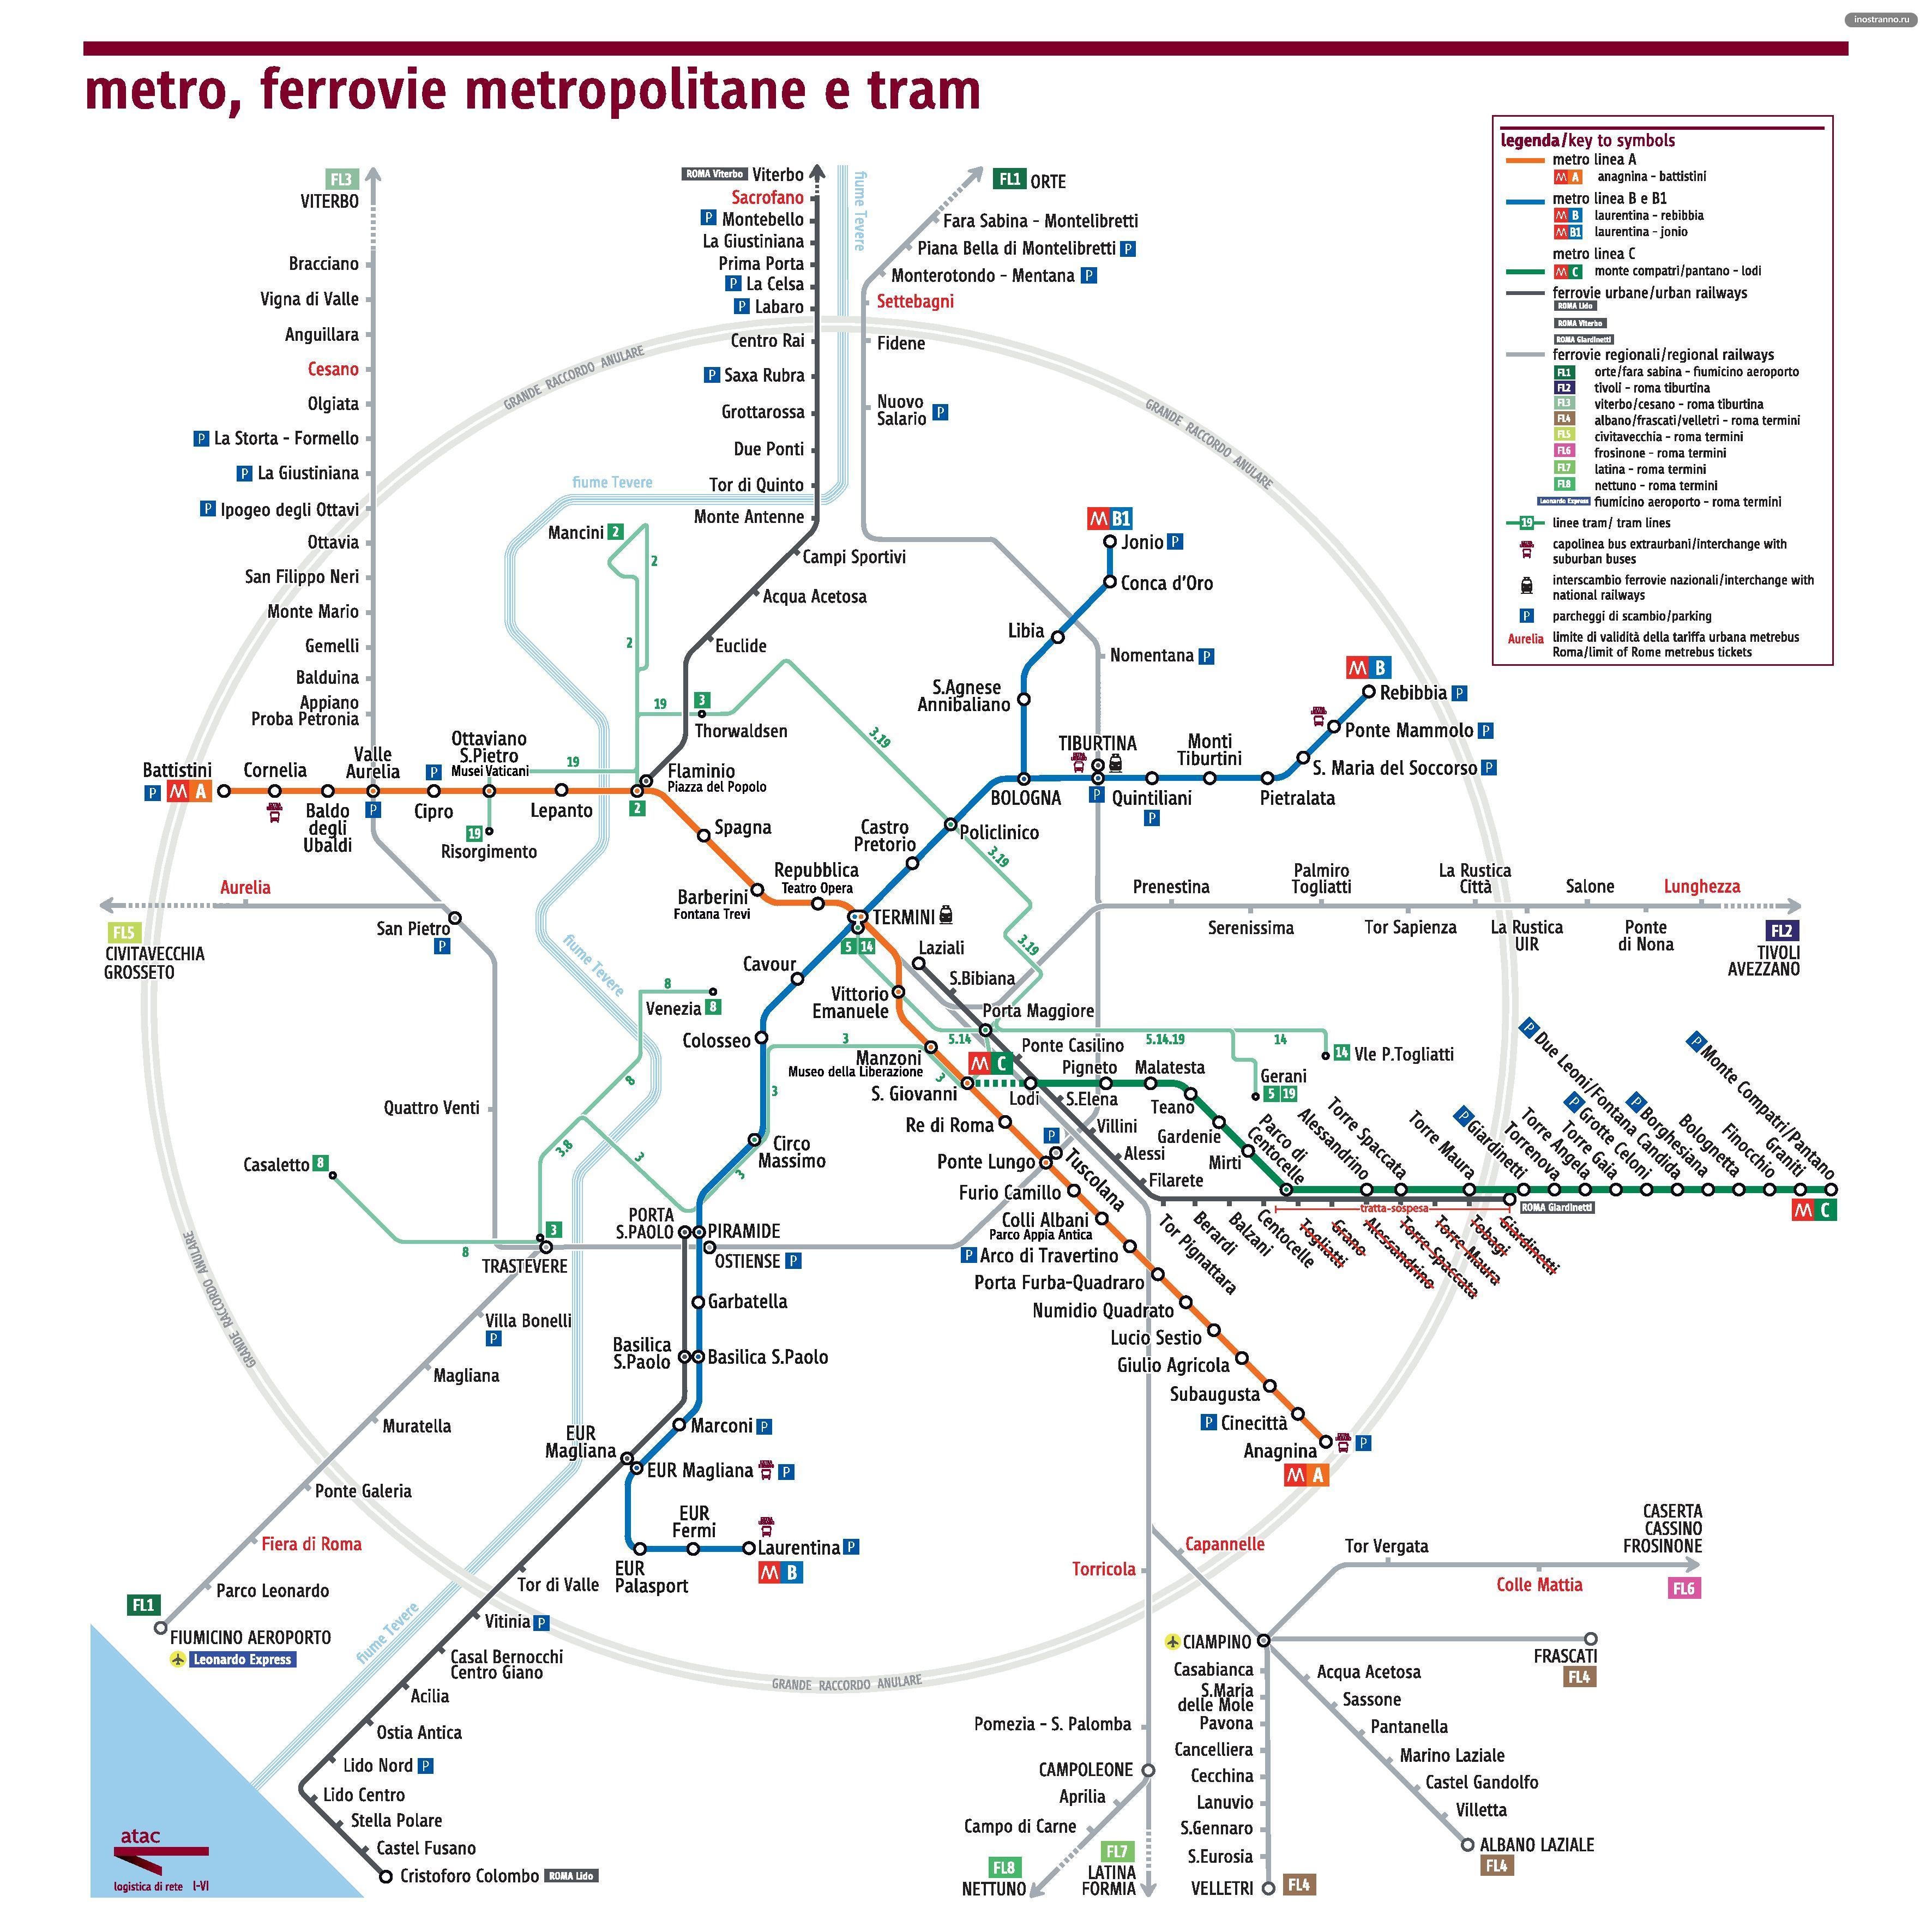 Карта метро и пригородных электричек Рима